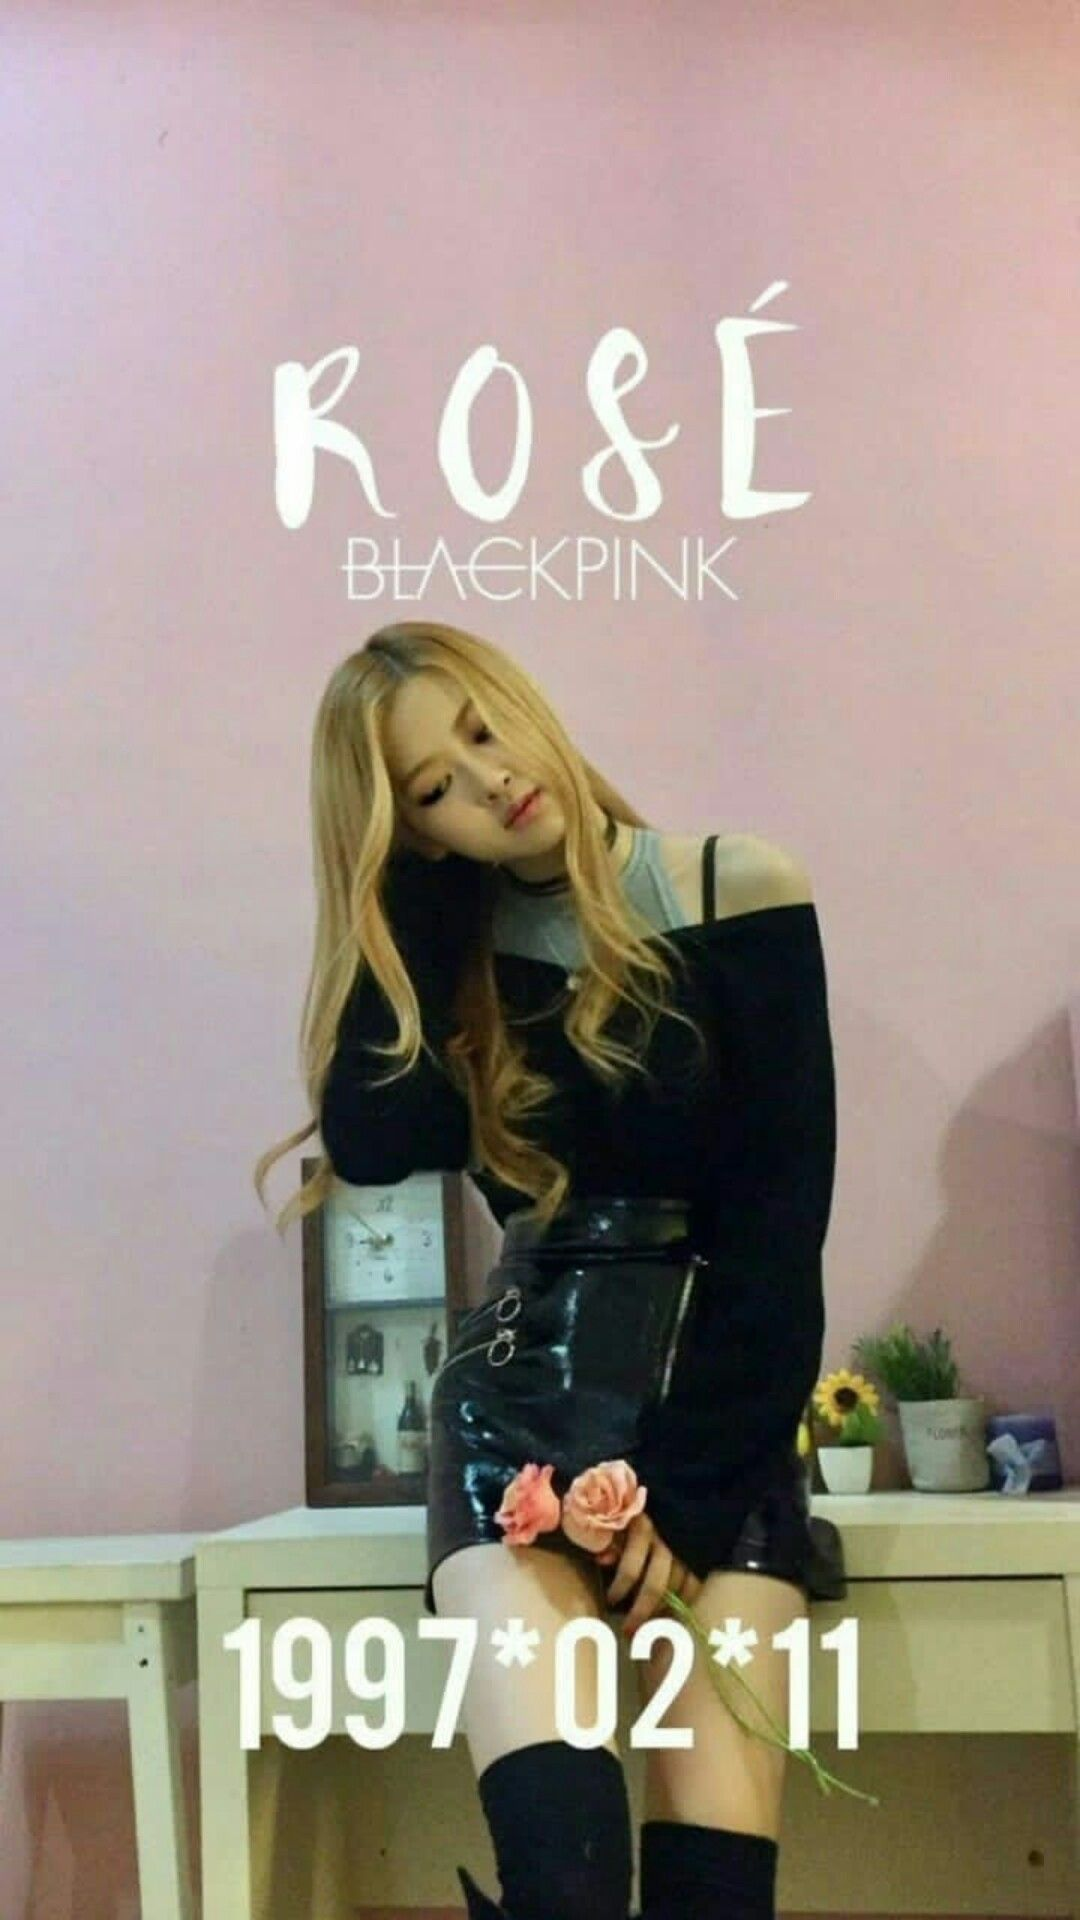 Amo a rosé loira blackpink em 2019 Blackpink, Rose